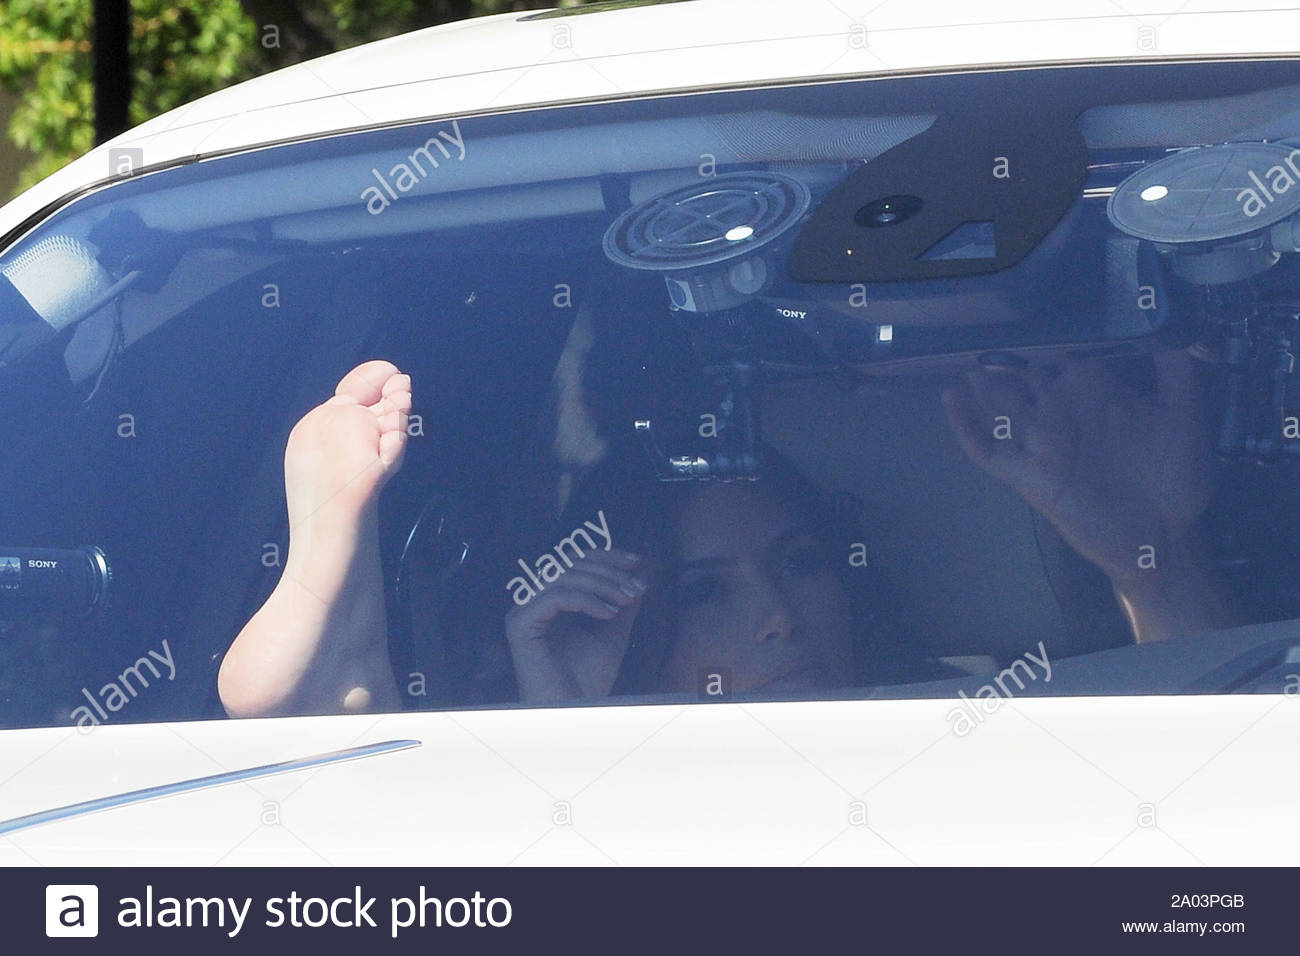 kim kardashian feet pics